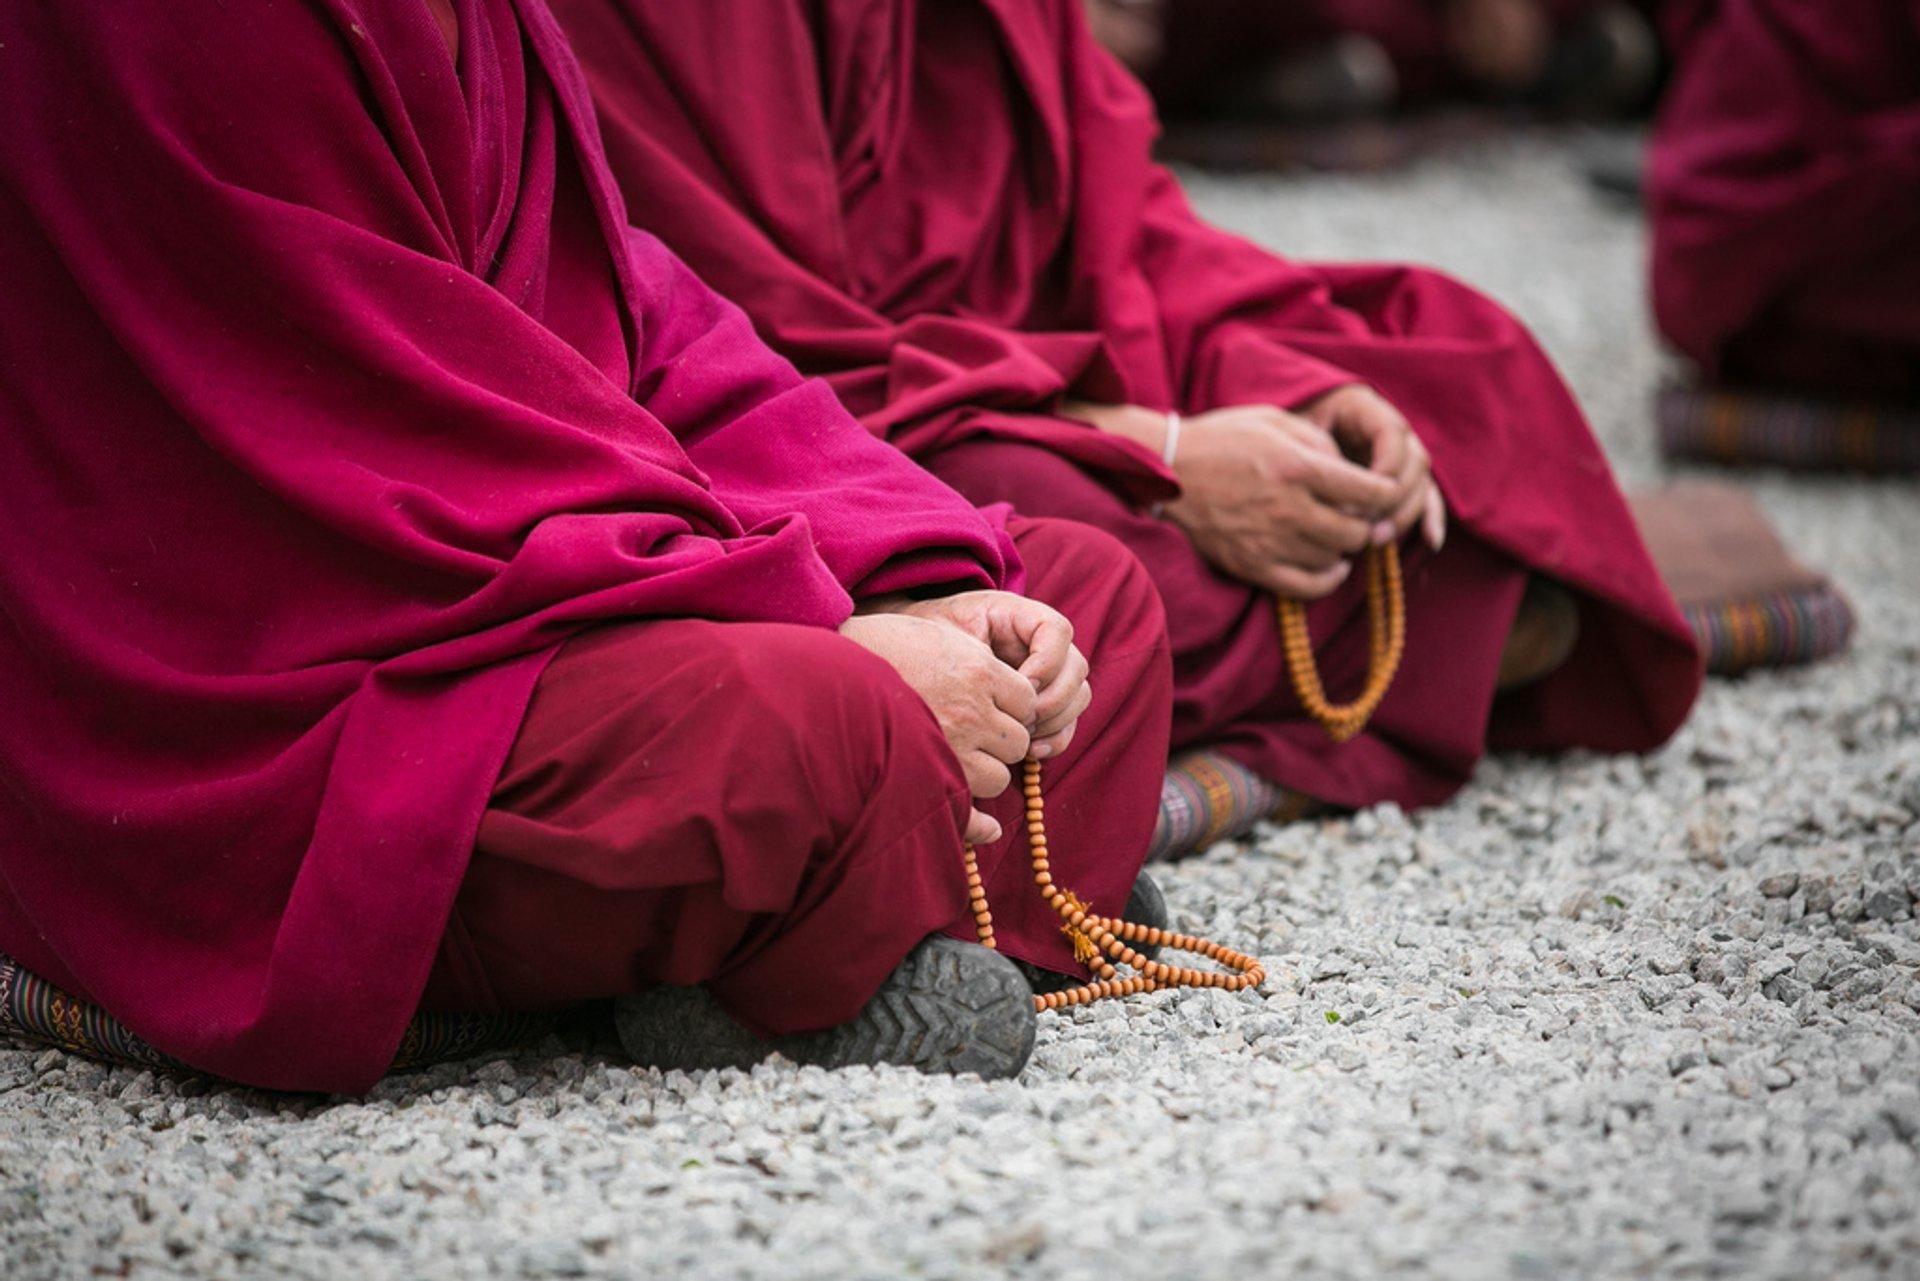 Monk Debates at Sera Monastery in Tibet 2020 - Best Time